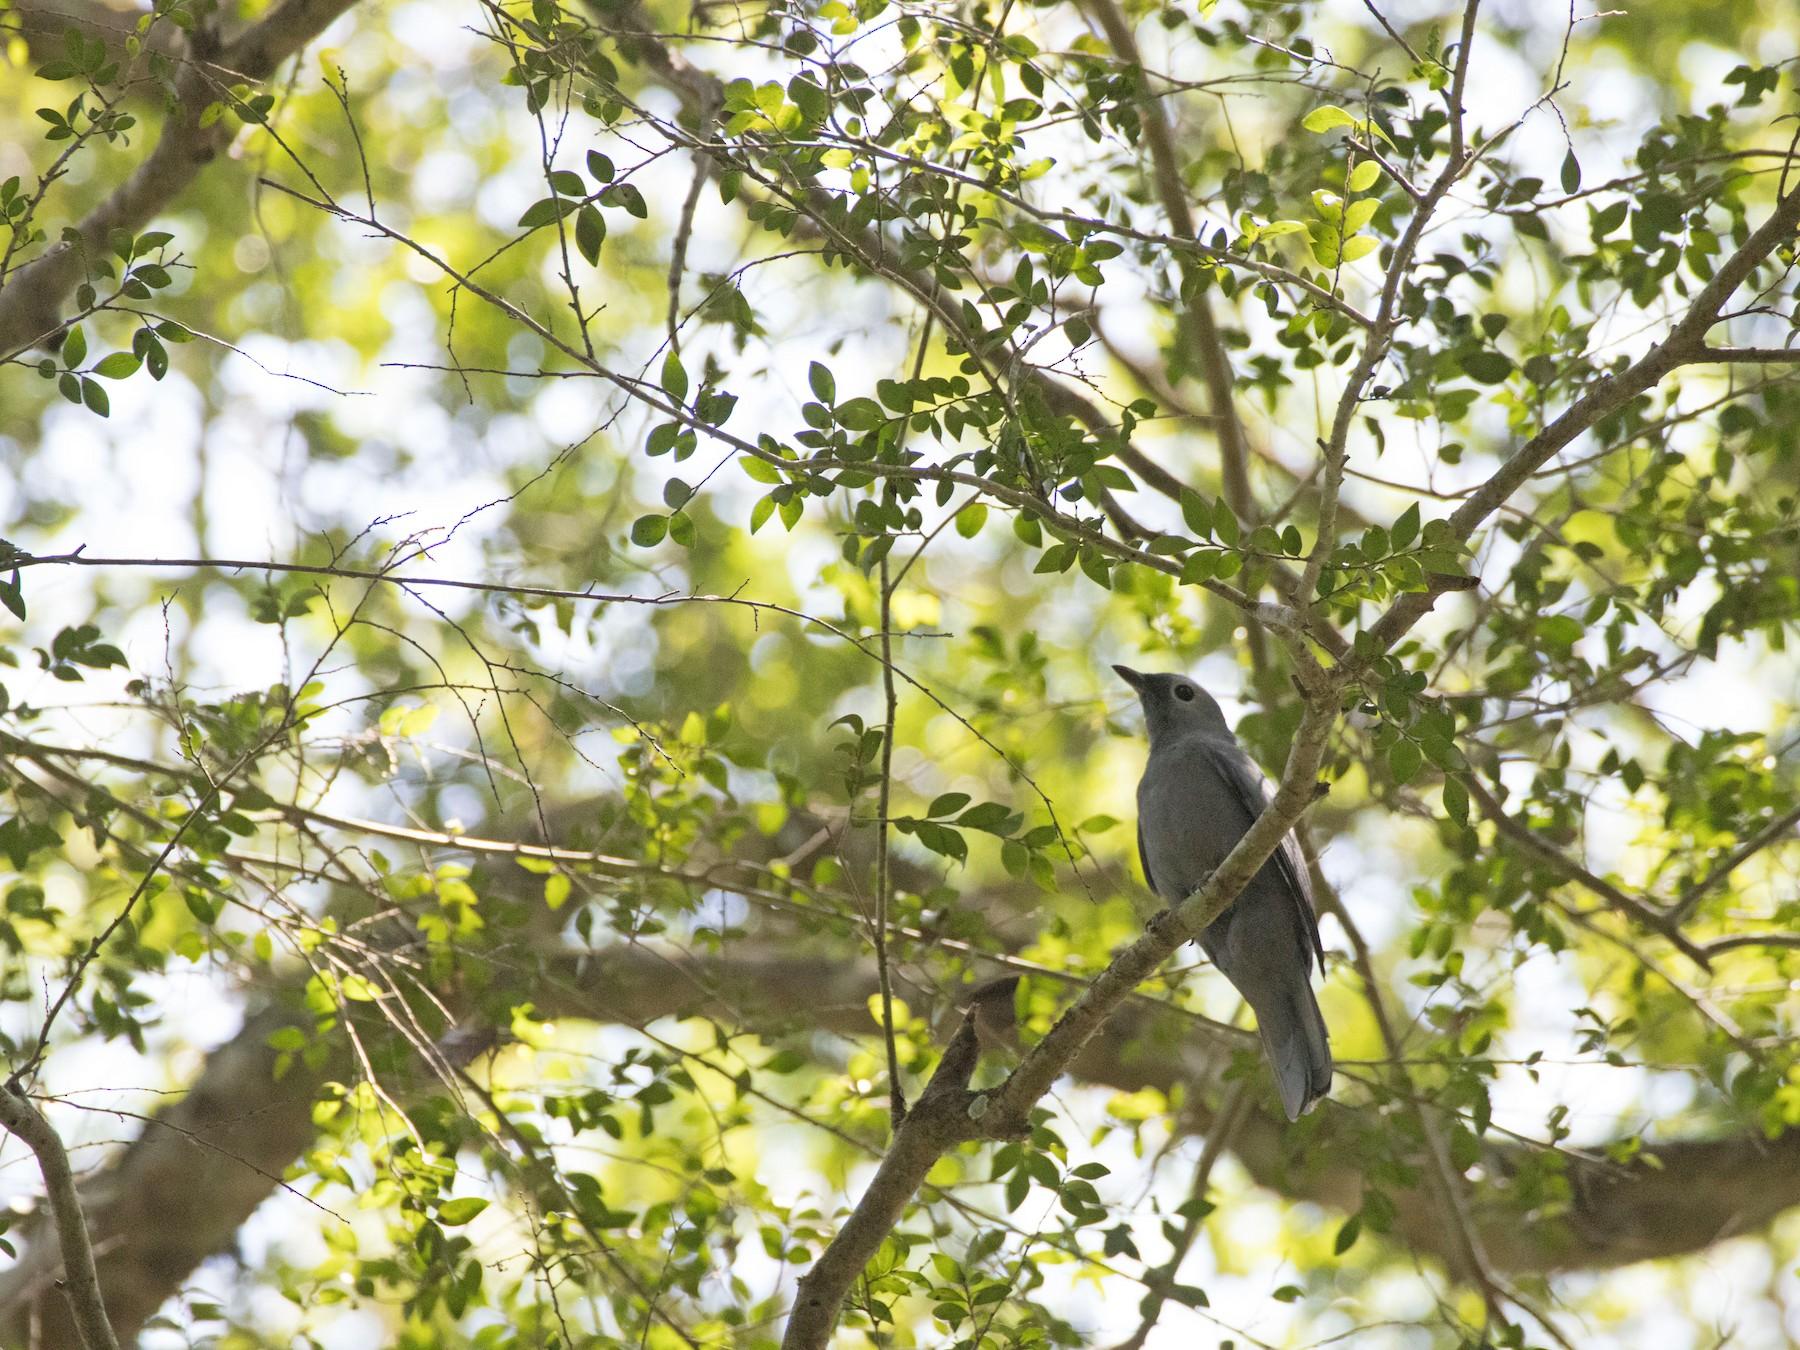 Gray Cuckooshrike - Angus Fitton